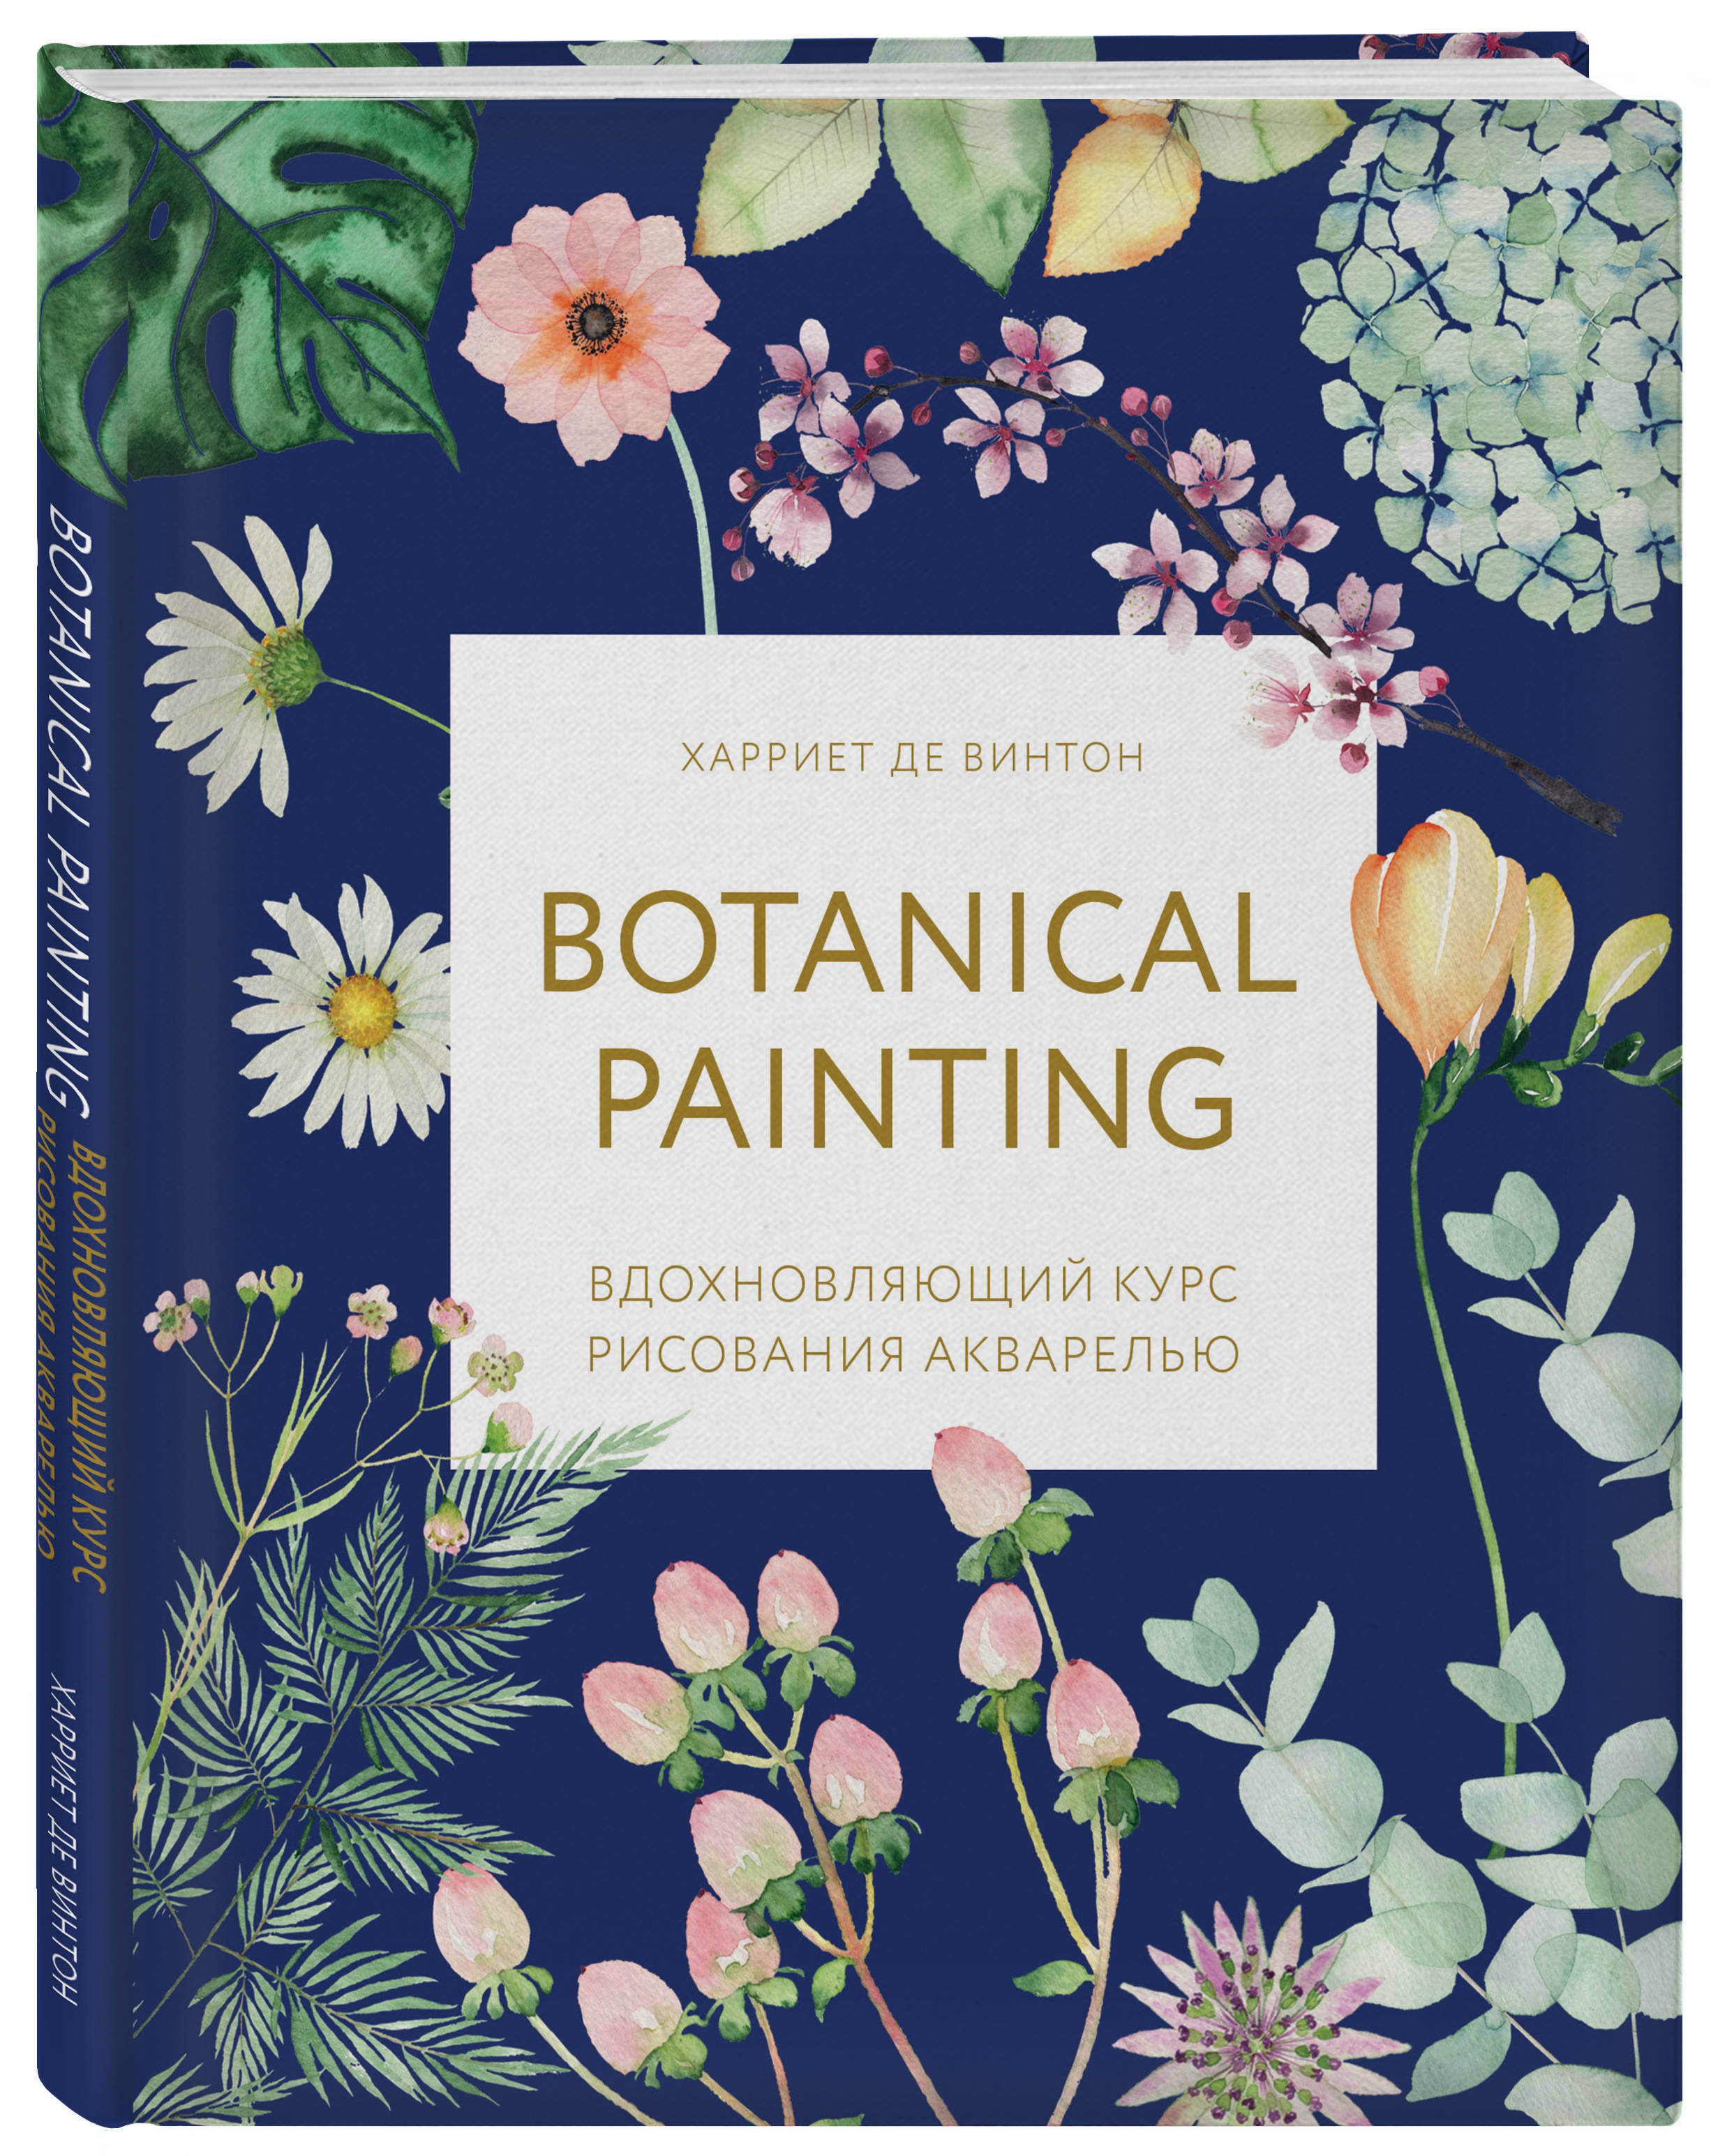 Botanical painting. Вдохновляющий курс рисования акварелью ( де Винтон Харриет  )